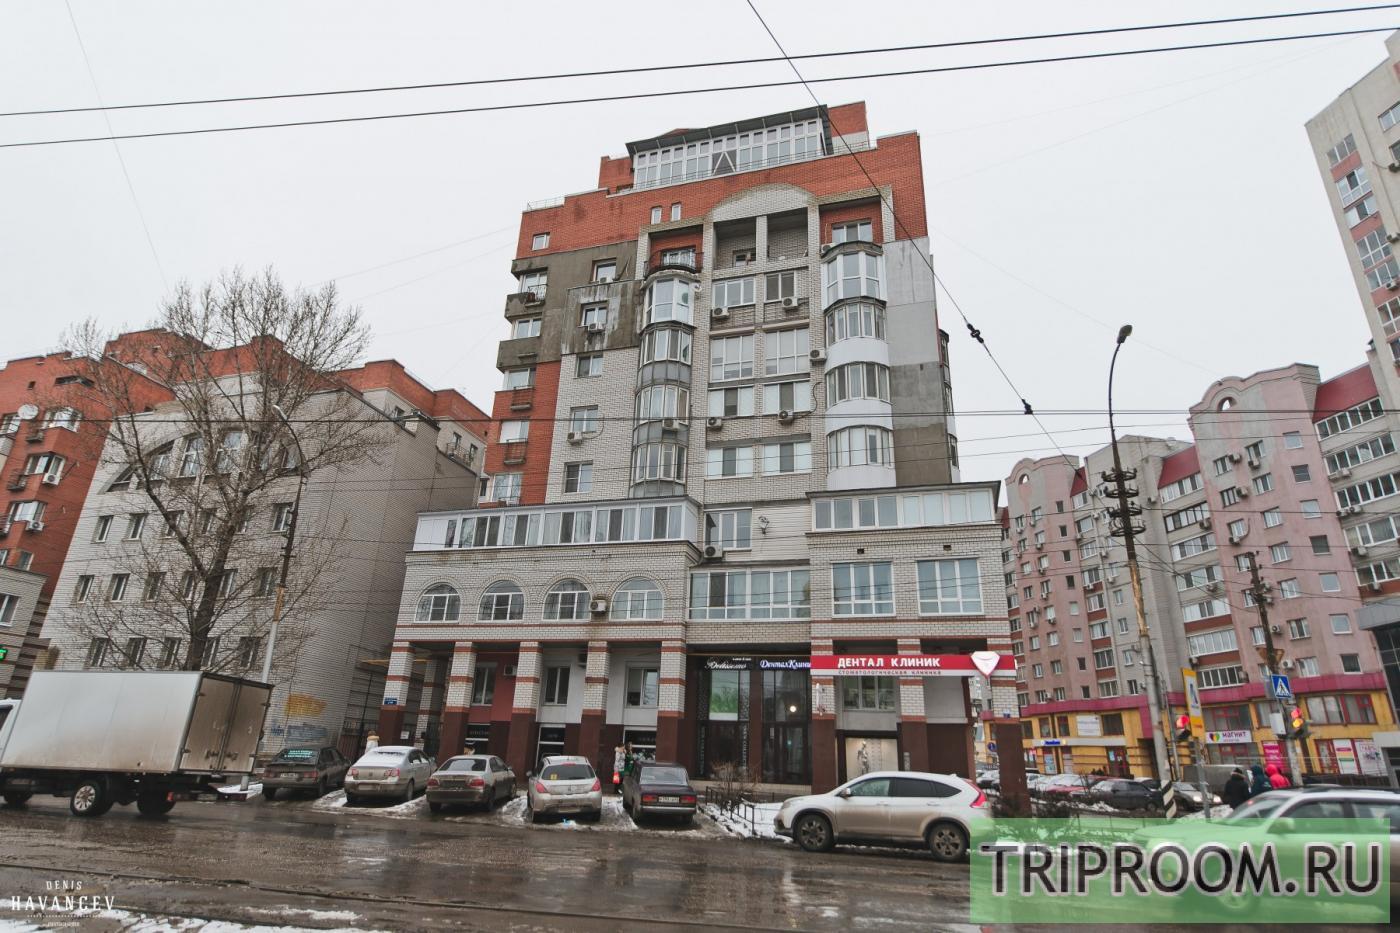 1-комнатная квартира посуточно (вариант № 14832), ул. Пугачева улица, фото № 12